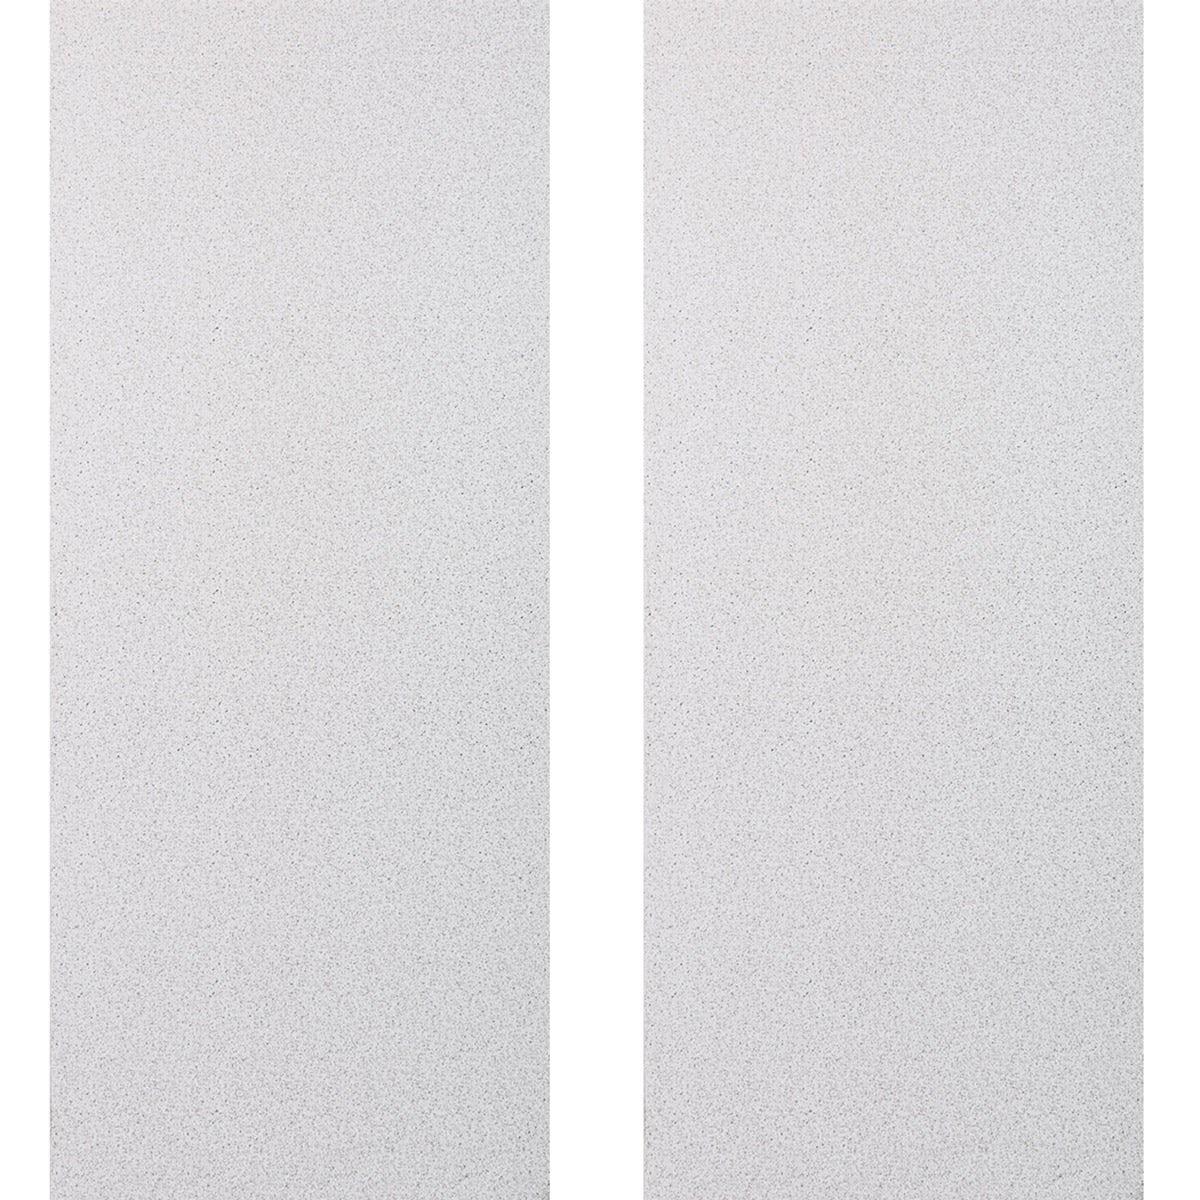 Multipanel Economy Sunlit Quartz shower wall 2 panel pack ...